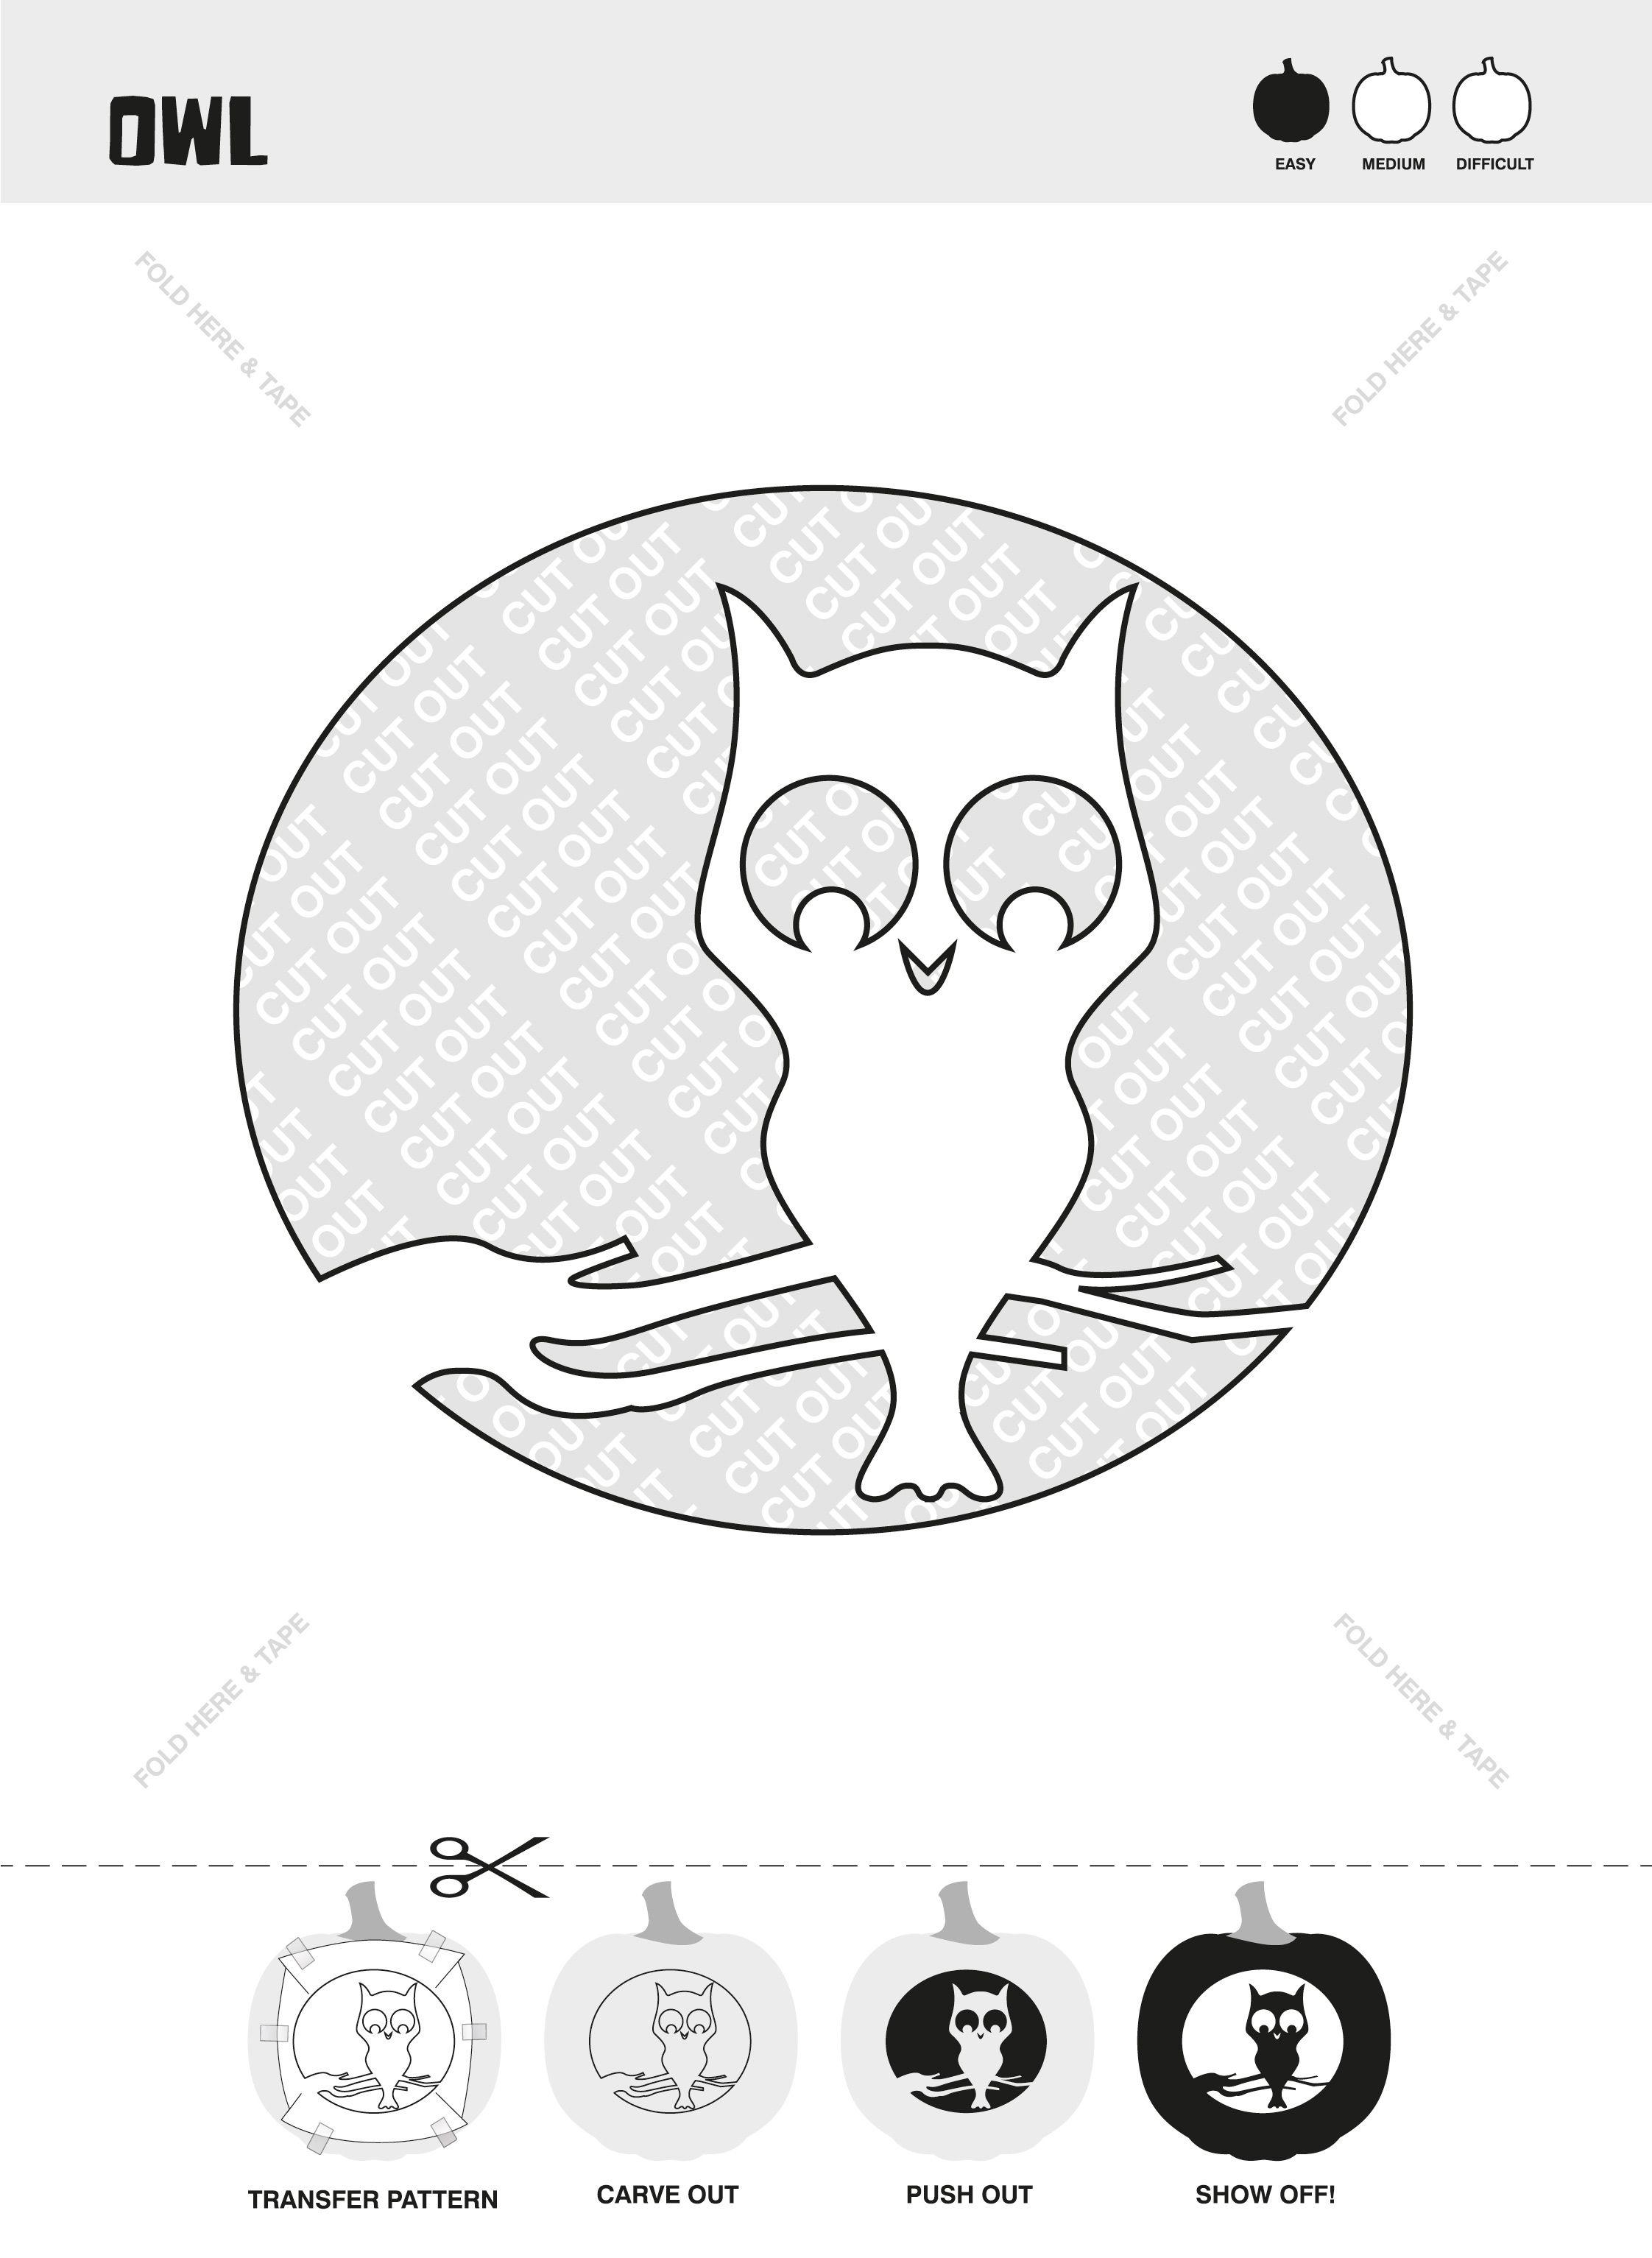 Owl Stencil Pumpkin carving kits, Halloween pumpkins